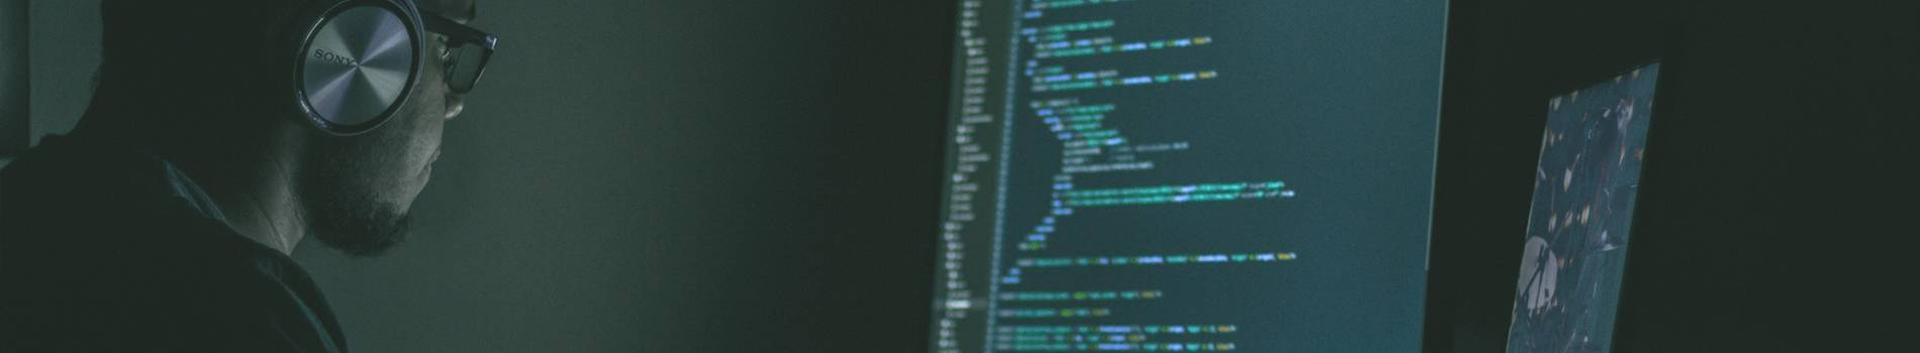 62011_programmeerimine_28701206_xl.jpg